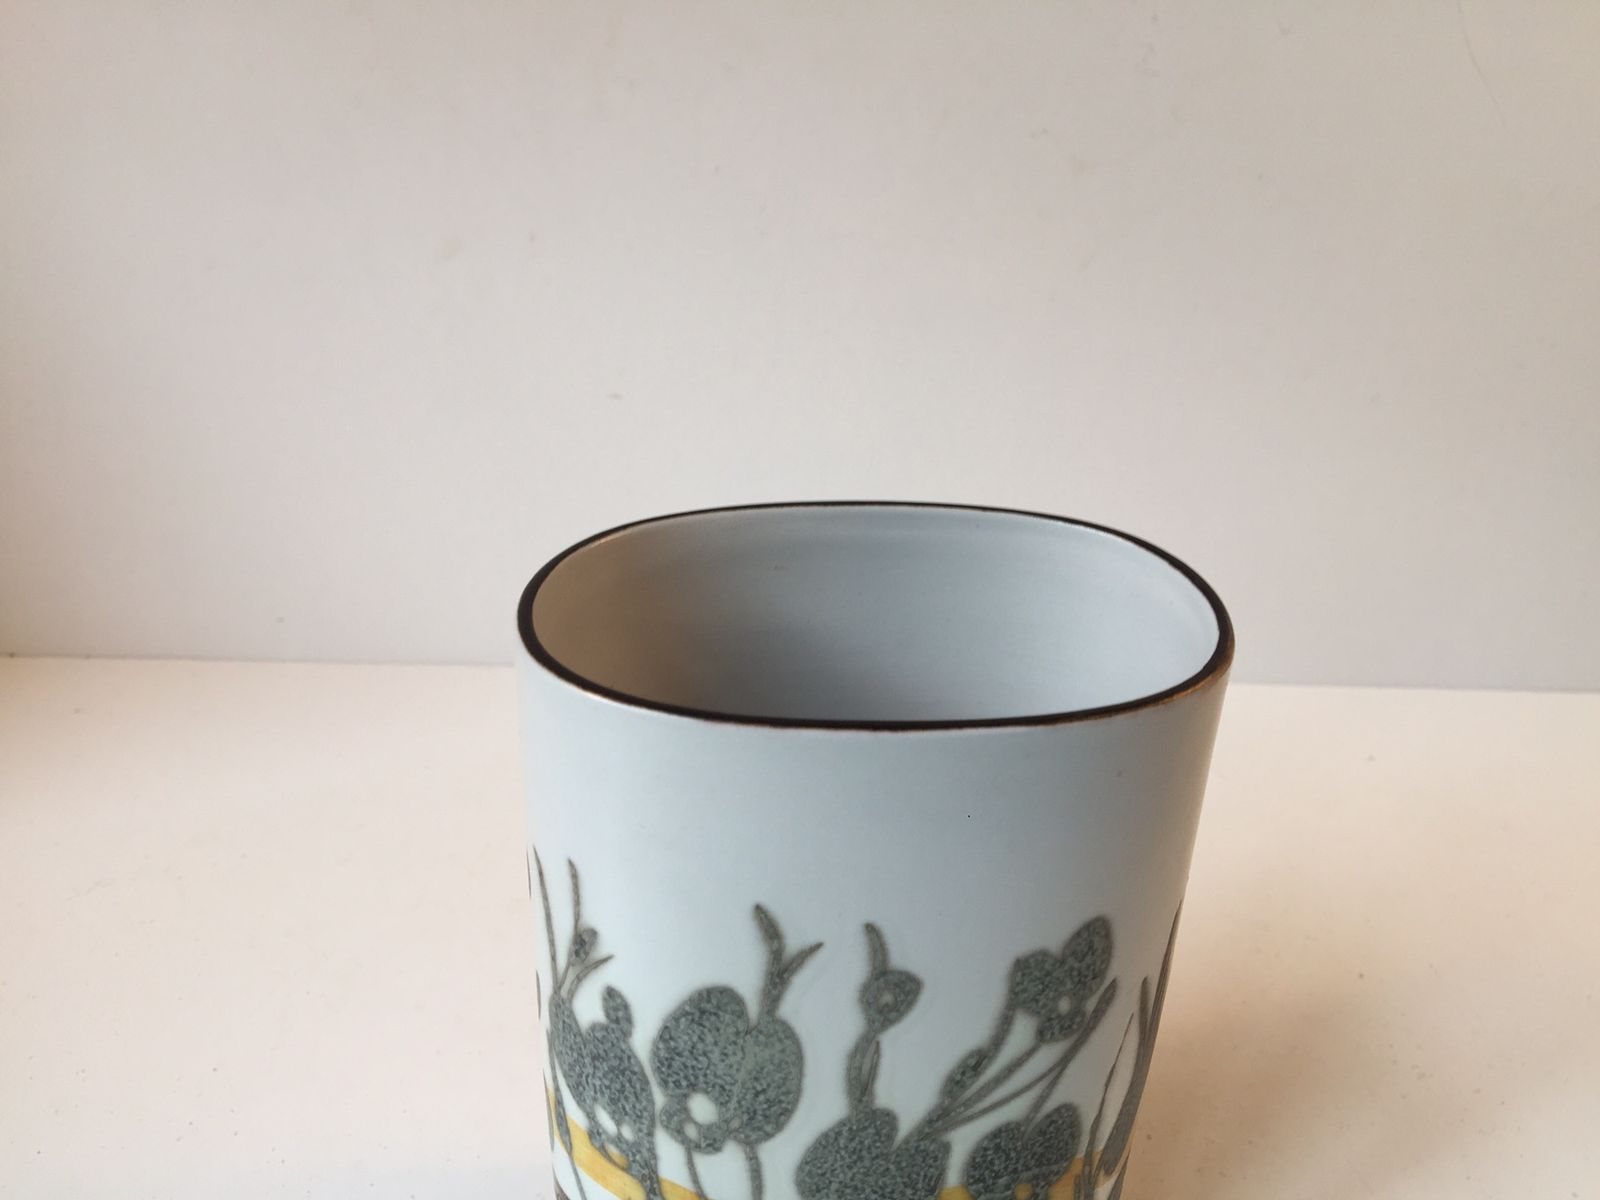 modernist ceramic vase by ivan weiss for royal copenhagen 1970s for sale at pamono. Black Bedroom Furniture Sets. Home Design Ideas